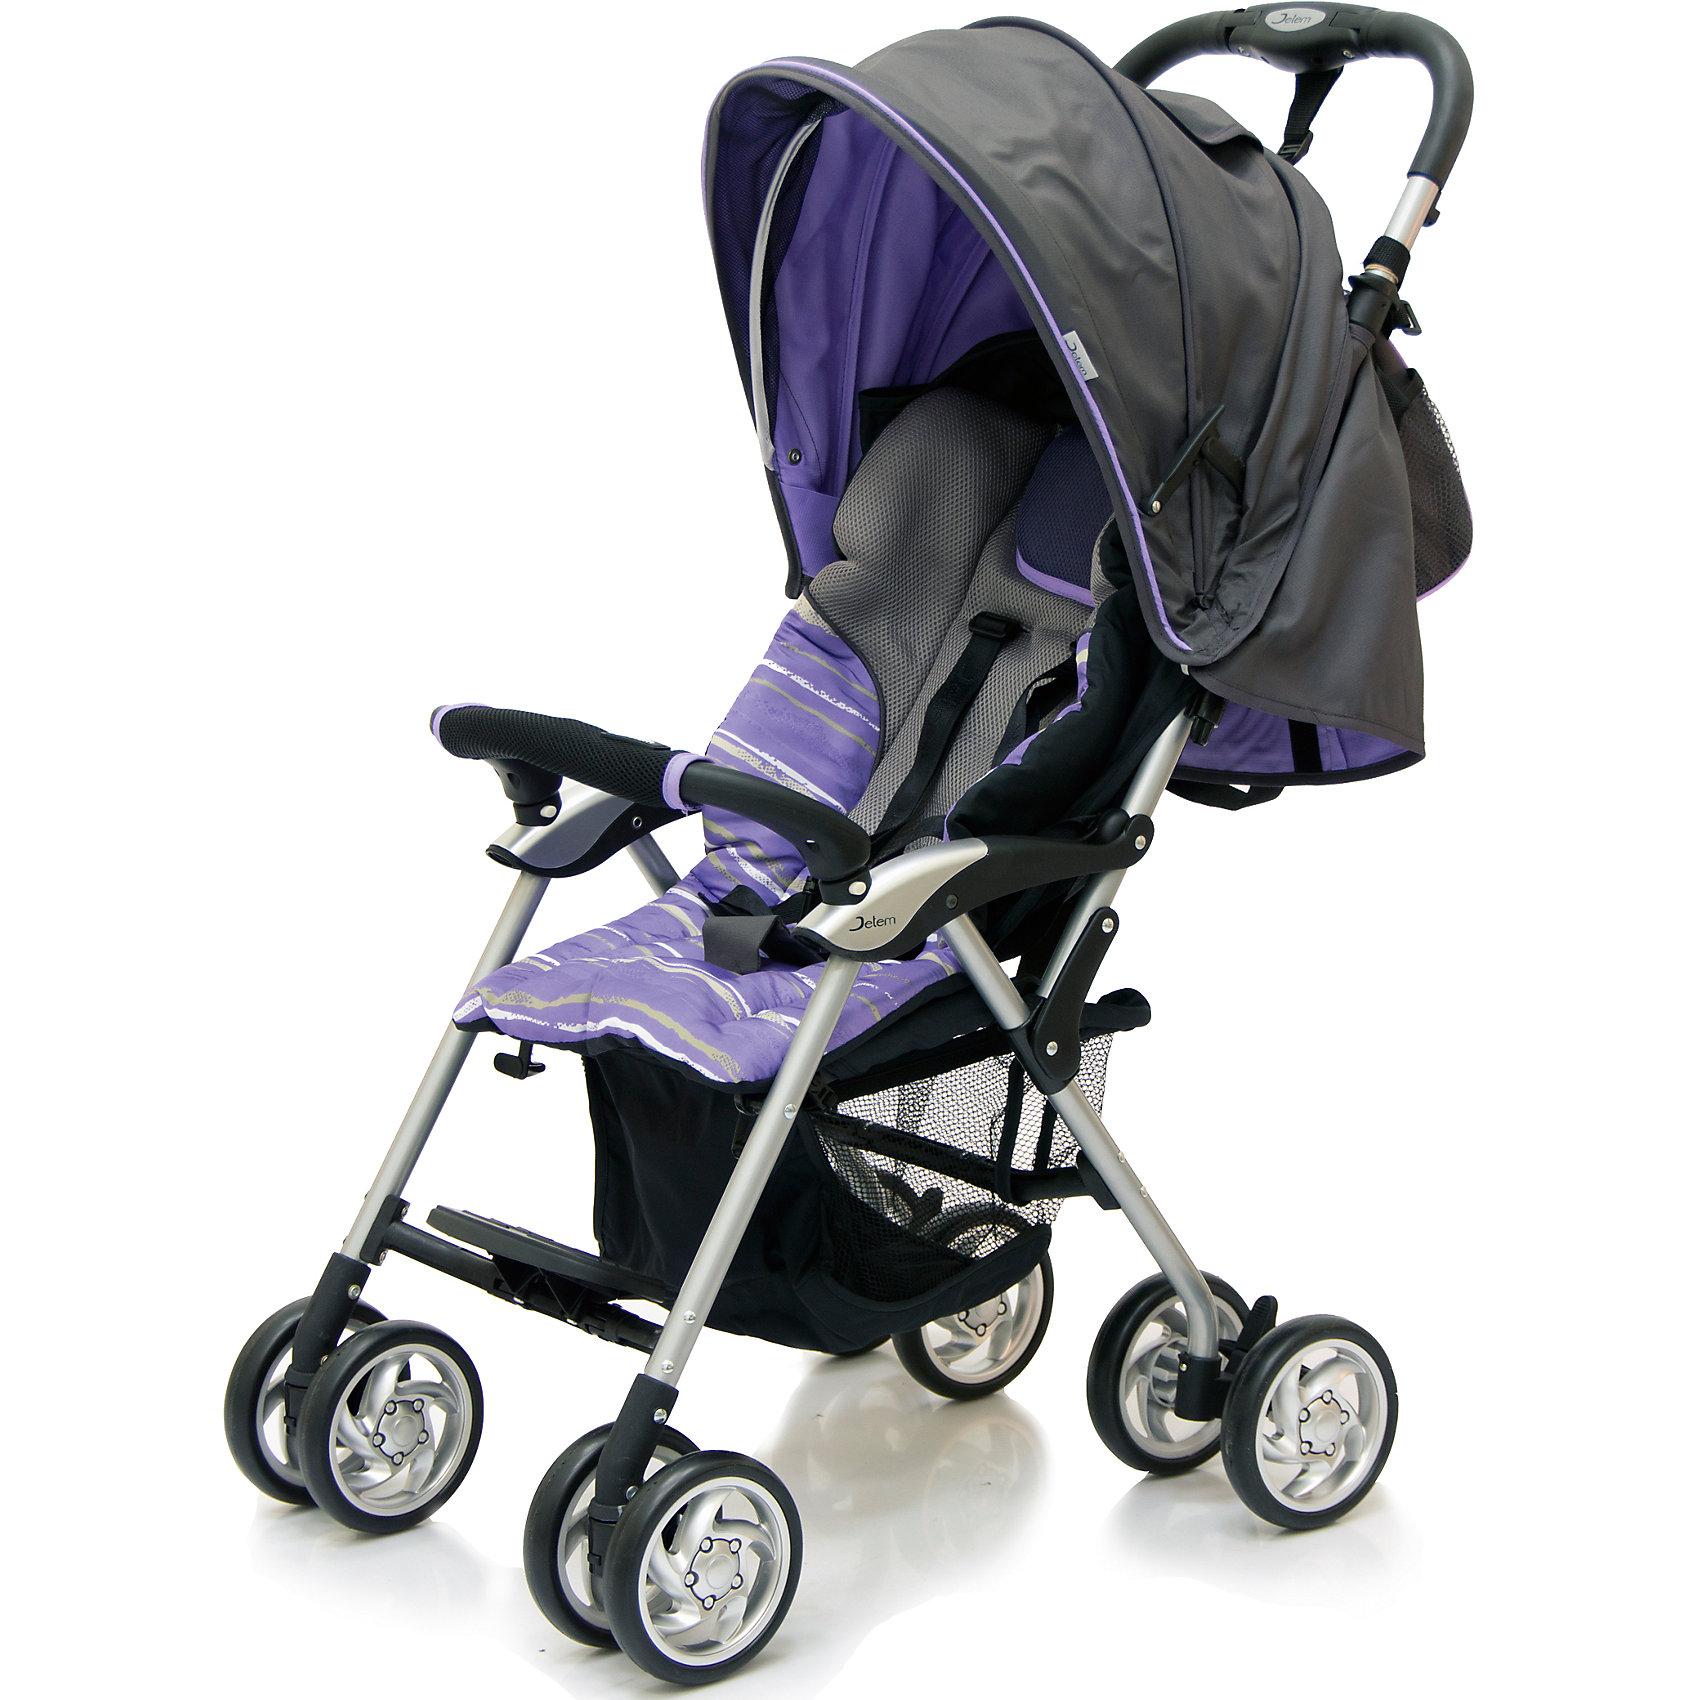 Jetem Прогулочная коляска Elegant, Jetem, темно-серый/фиолетовый, полоска коляска трость jetem elegant dark grey blue полоска